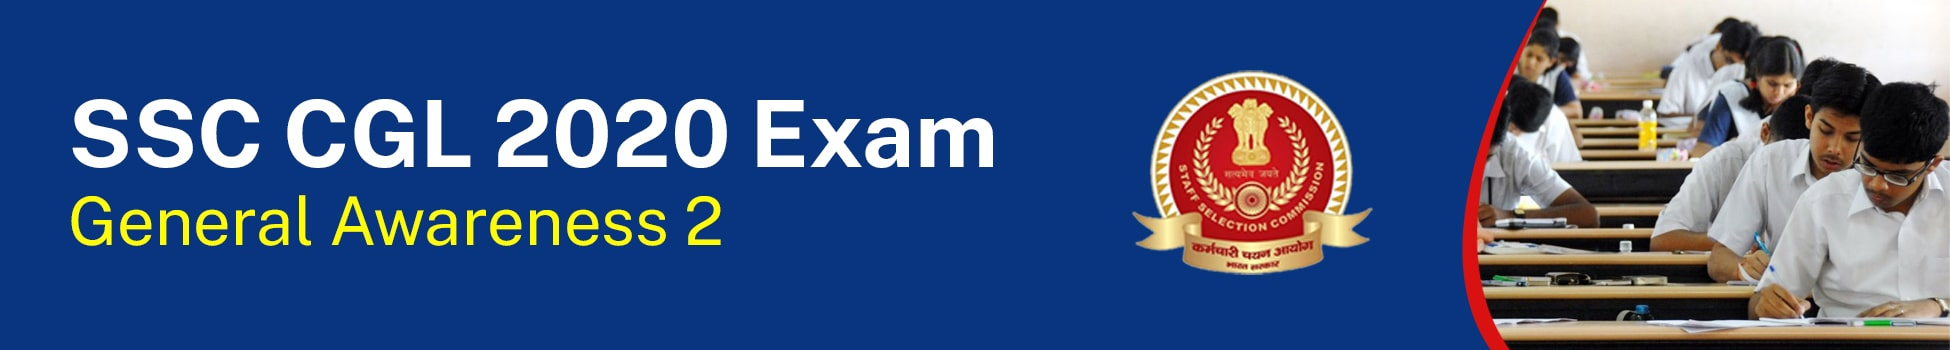 SSC CGL 2020 Exam - General Awareness 2